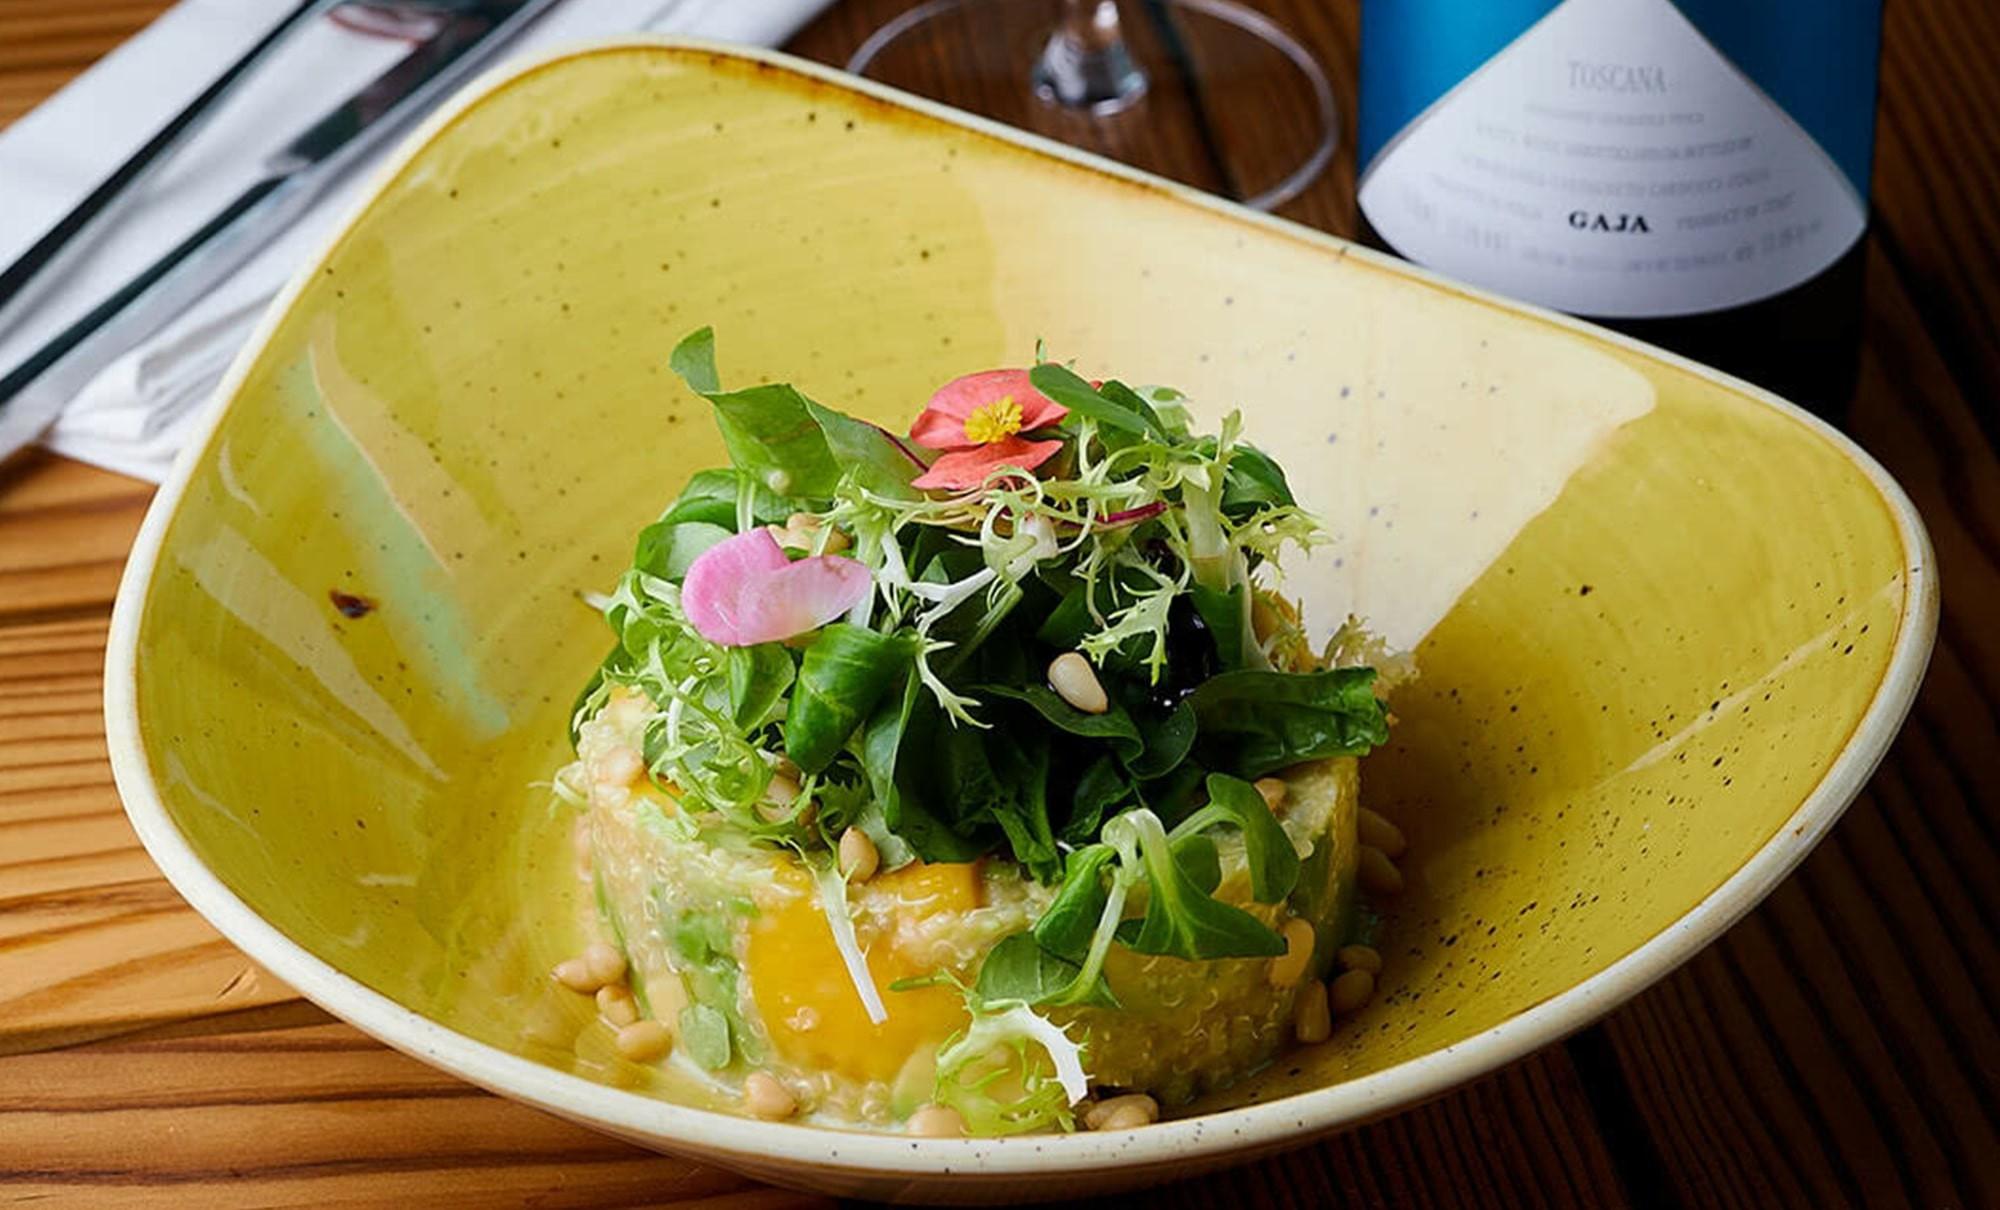 салат с авокадо, манго и киноа в ресторане Веранда